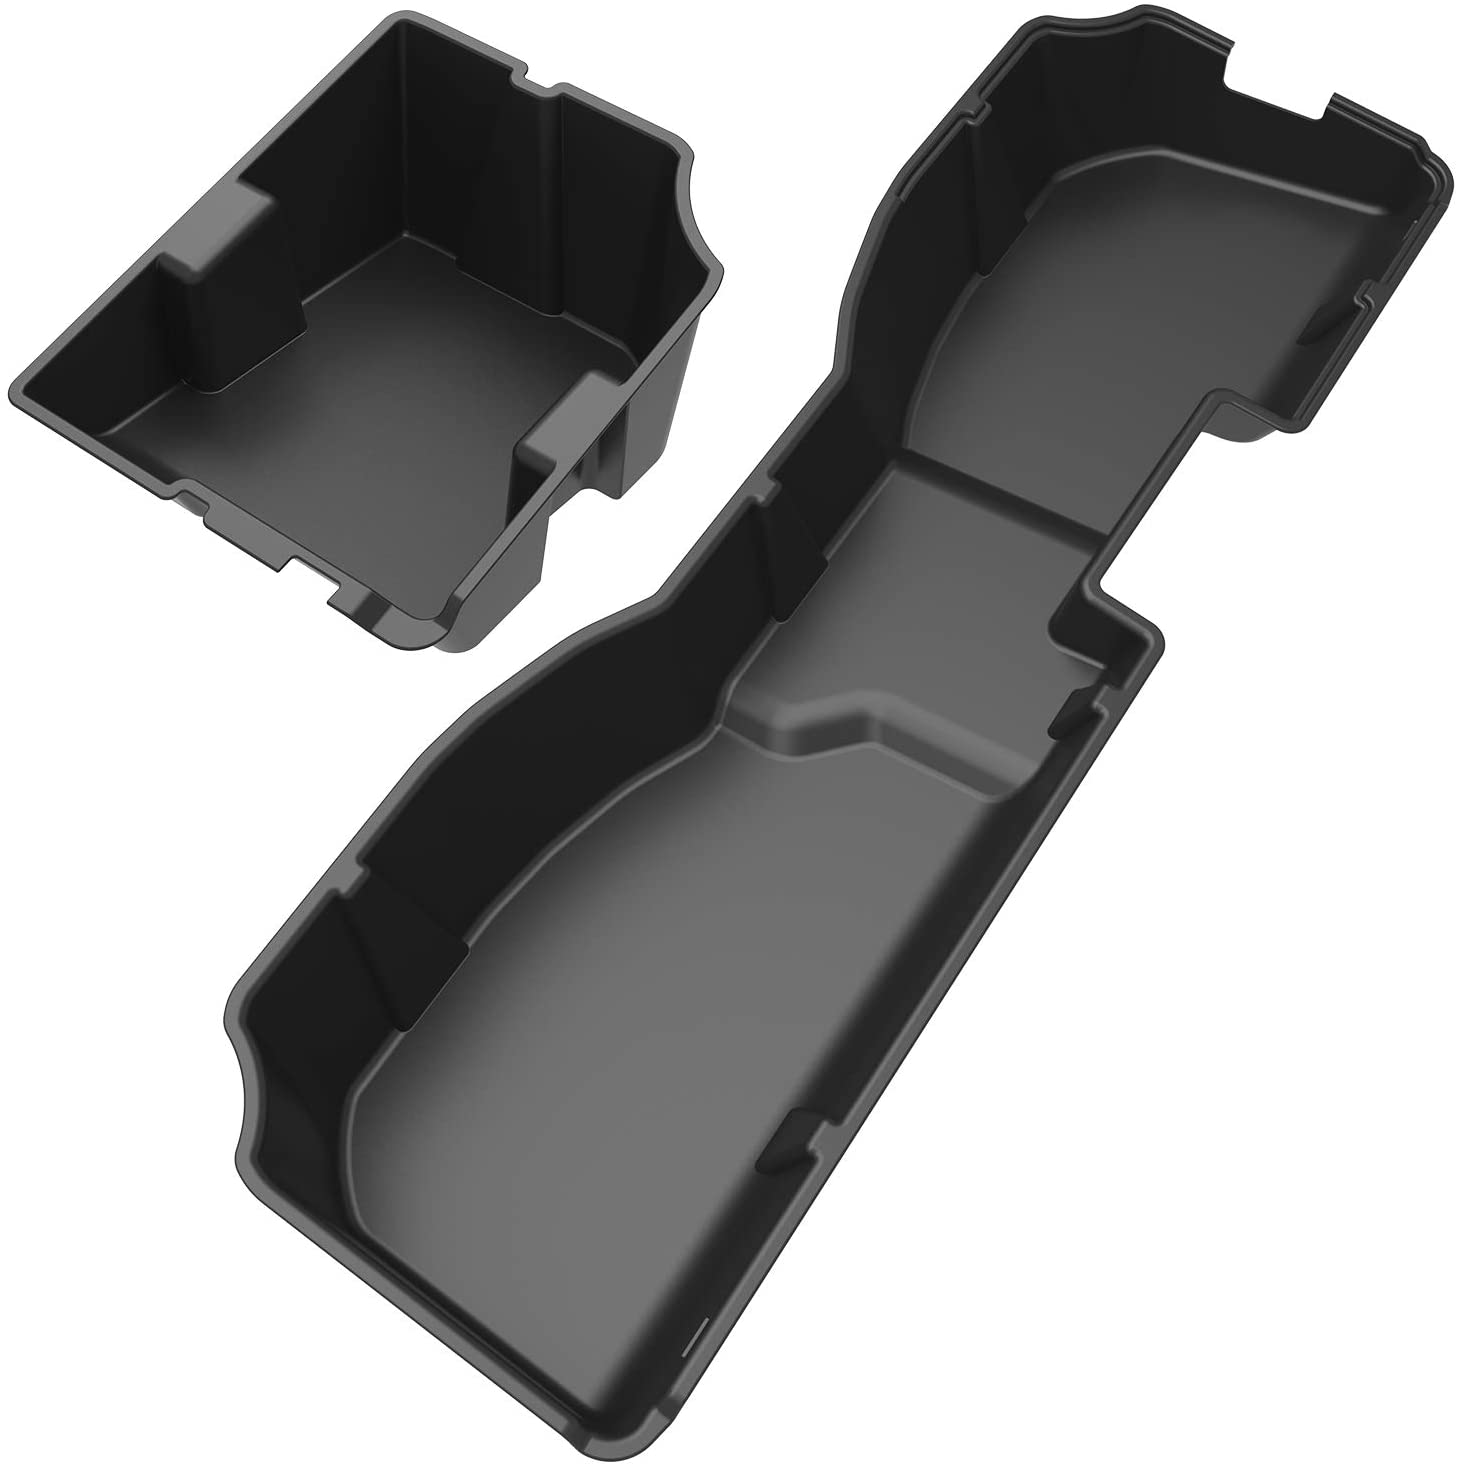 Maxiii Under Seat Storage Box Compatible with 2014-2018 Chevrolet Silverado/GMC Sierra 1500, 2015-2019 Silverado/Sierra 2500 3500 HD Crew Cab, Textured Black, 2-in-1 Design,Spacious Storage